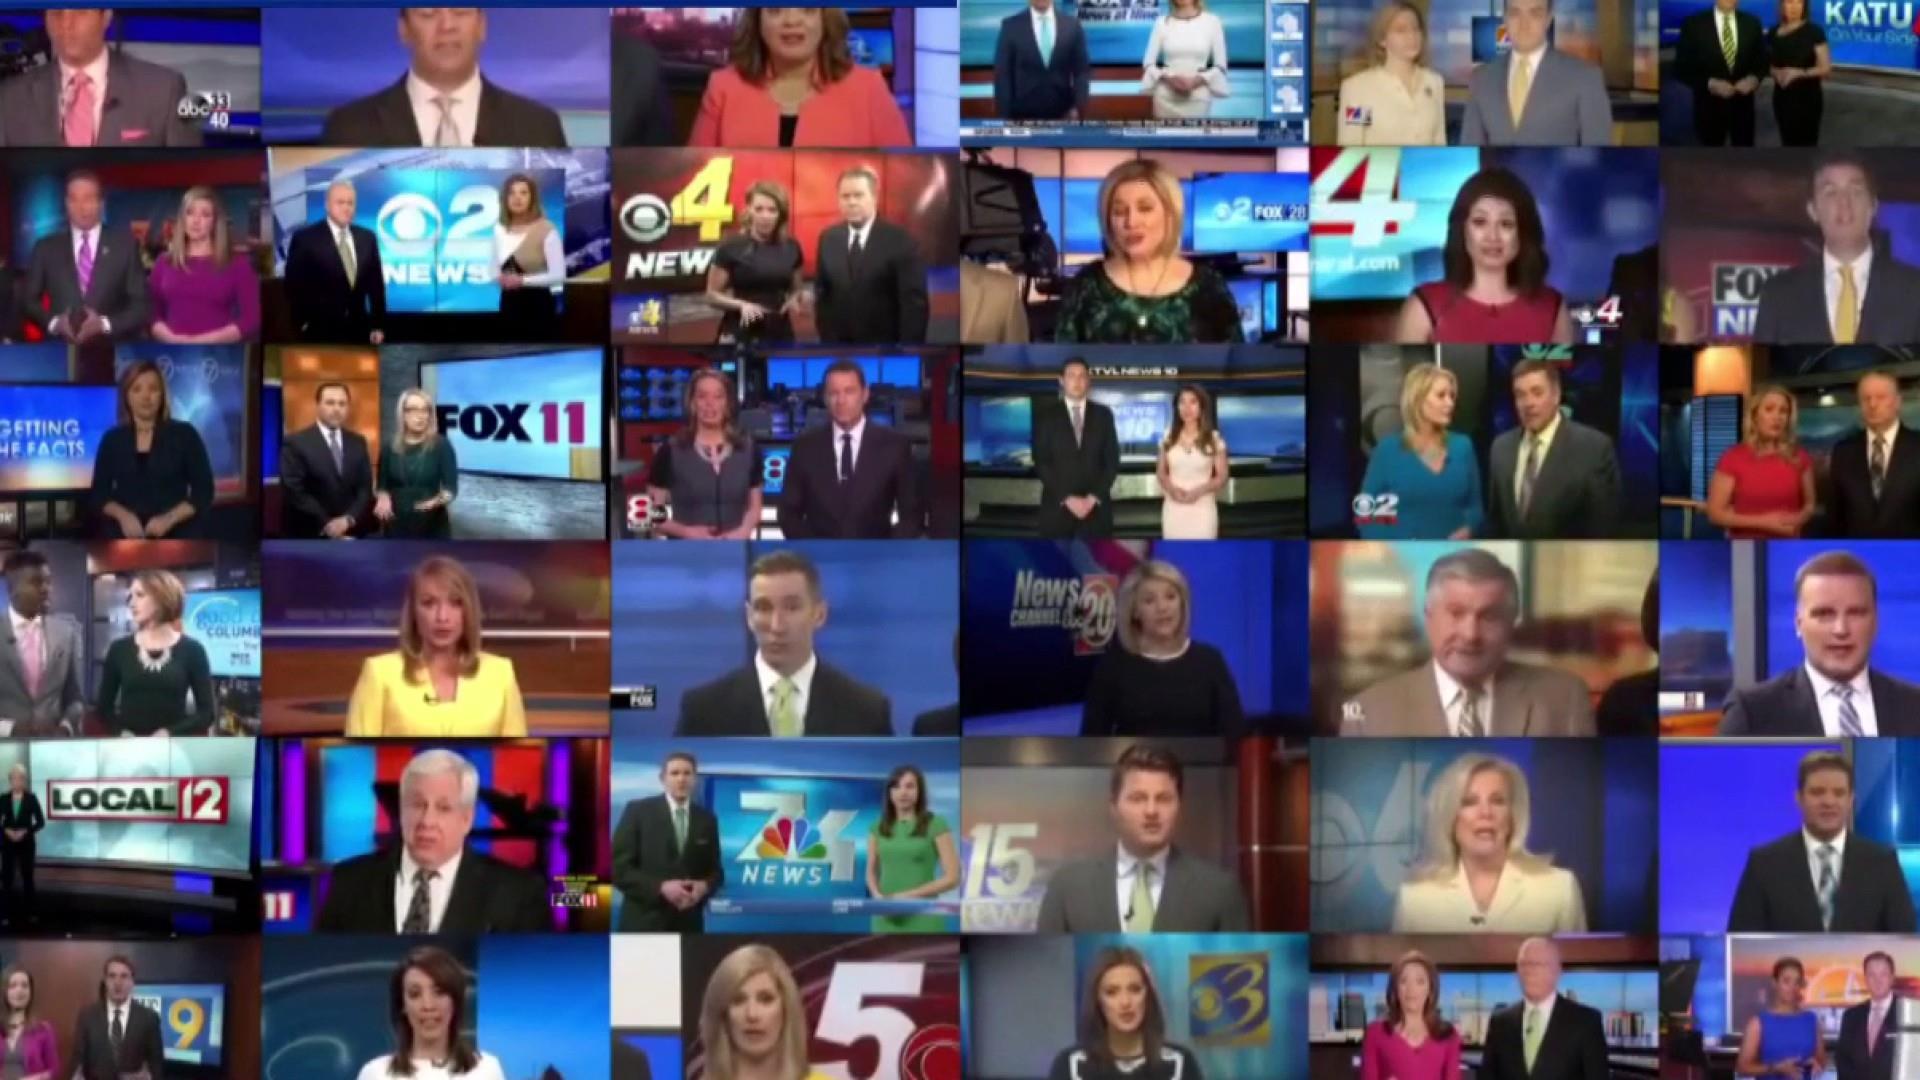 Trump hails Sinclair amidst anchors forced to read media-bashing scripts